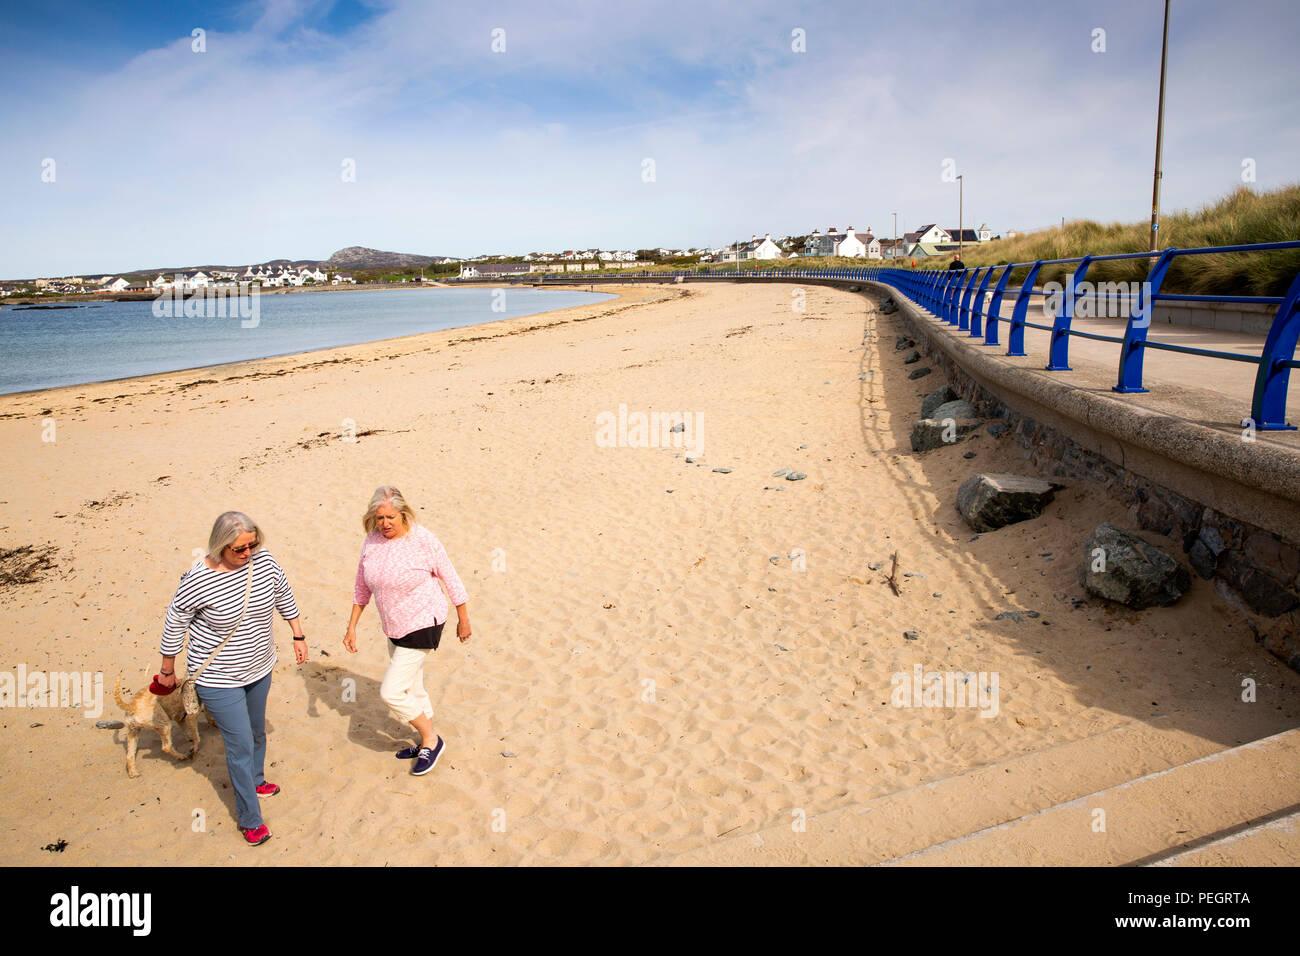 UK, Wales, Anglesey, Trearddur Bay, women dog walkers on beach in sunshine - Stock Image